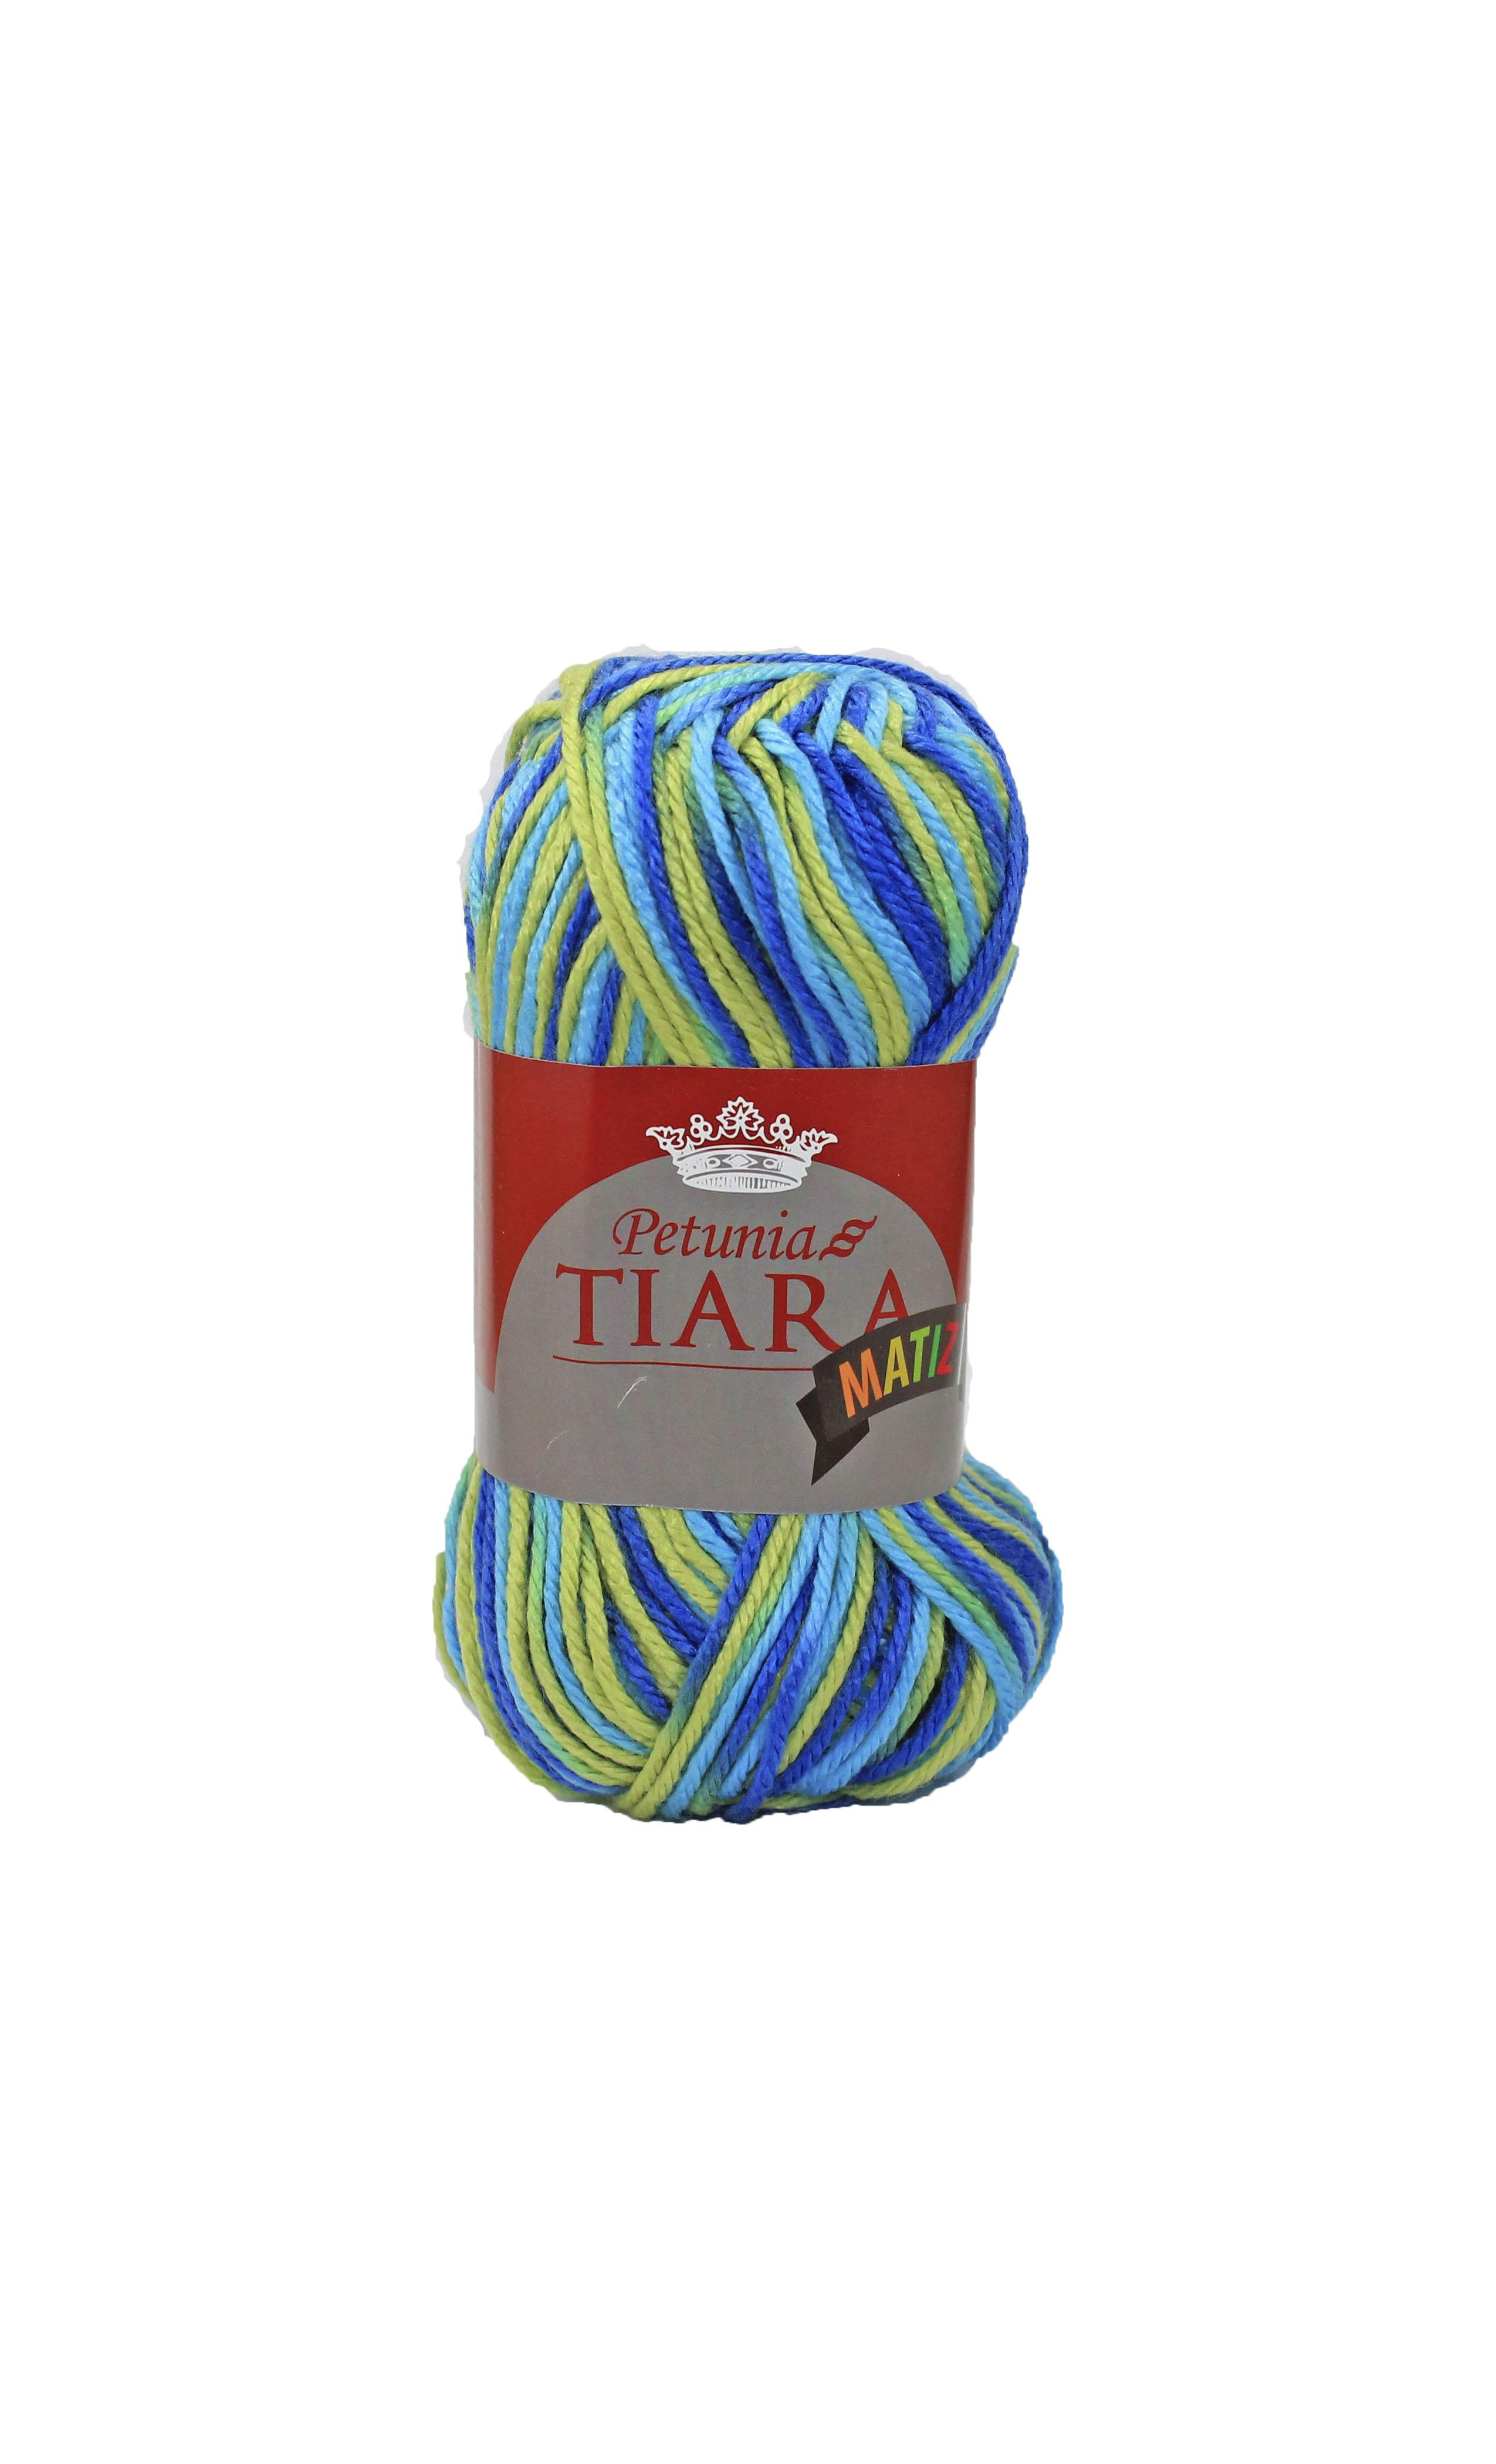 Tiara Matiz - 992